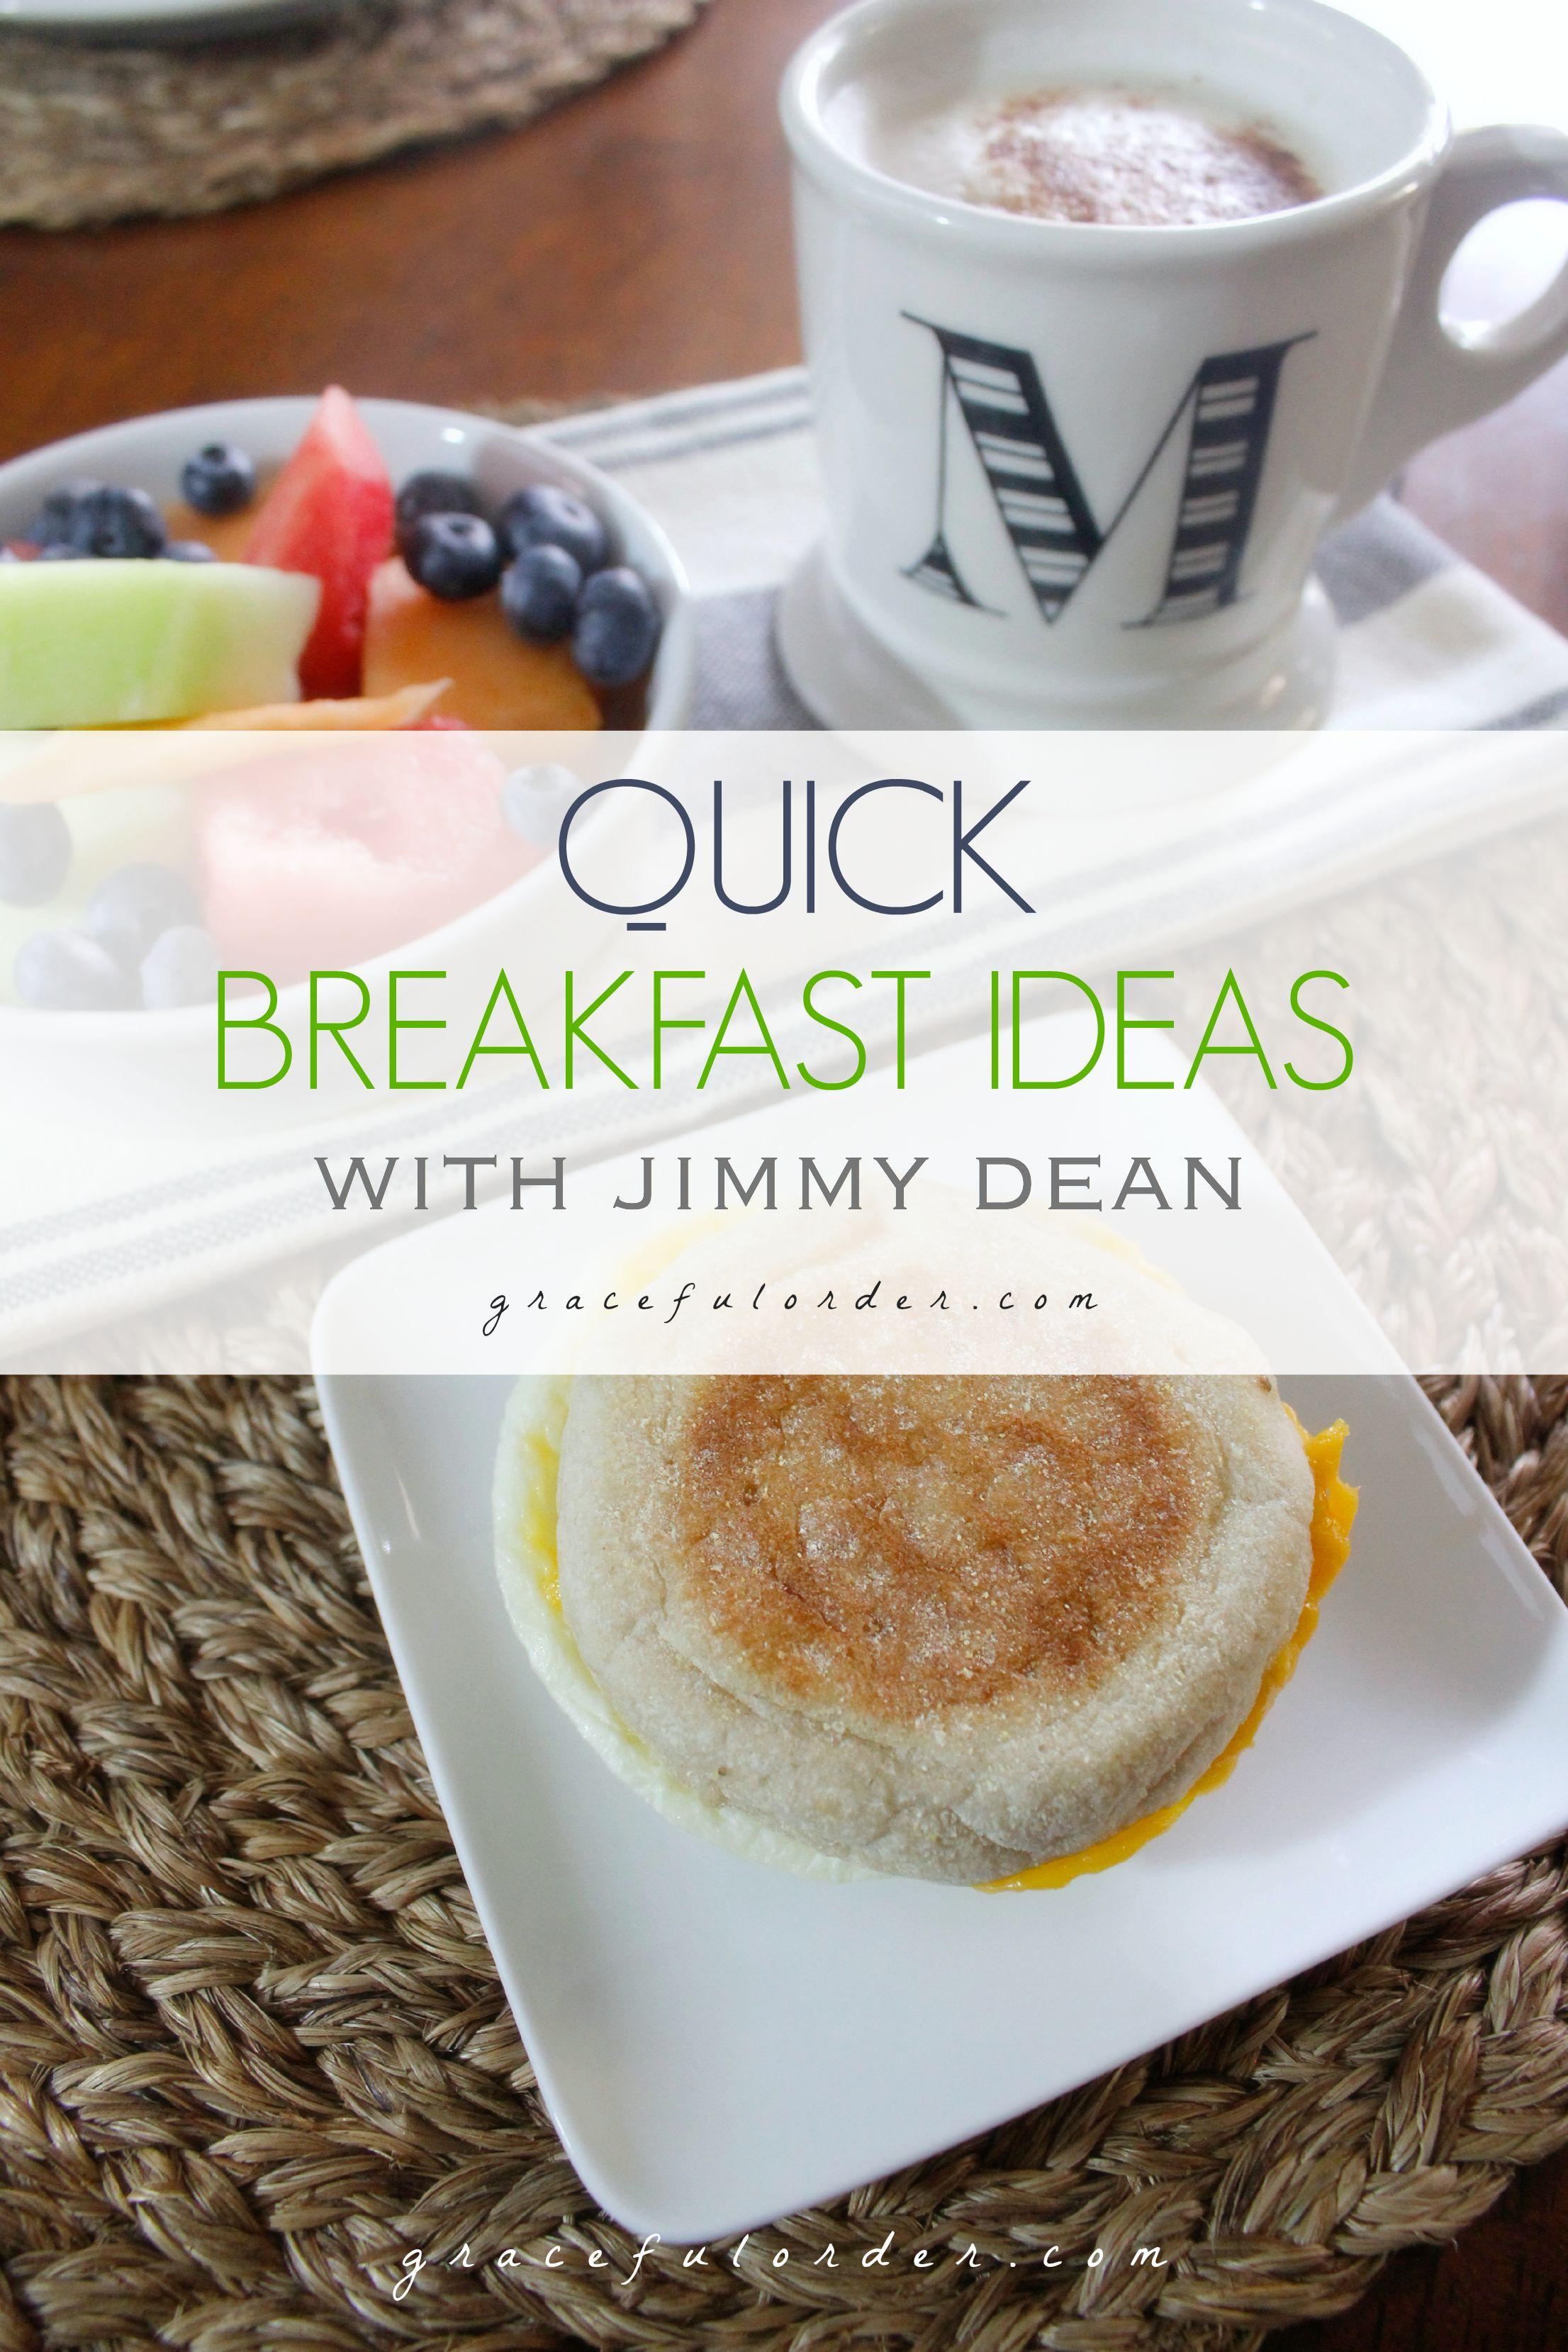 Quick Breakfast Ideas with Jimmy Dean - Graceful Order